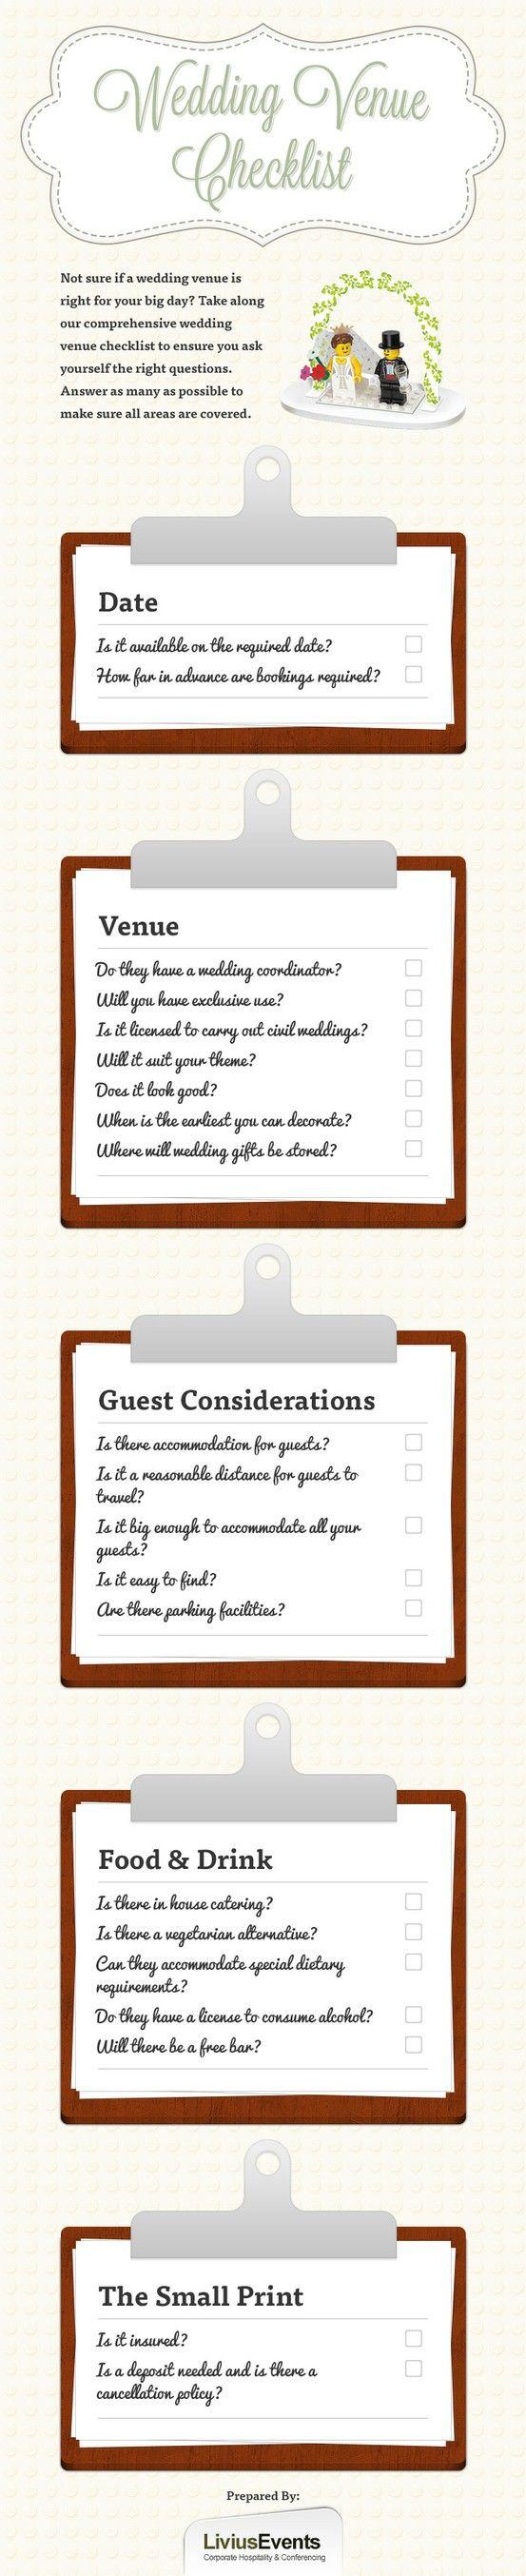 Fabulous Wedding Venue Questions Free Printable Checklist Venues And Weddings